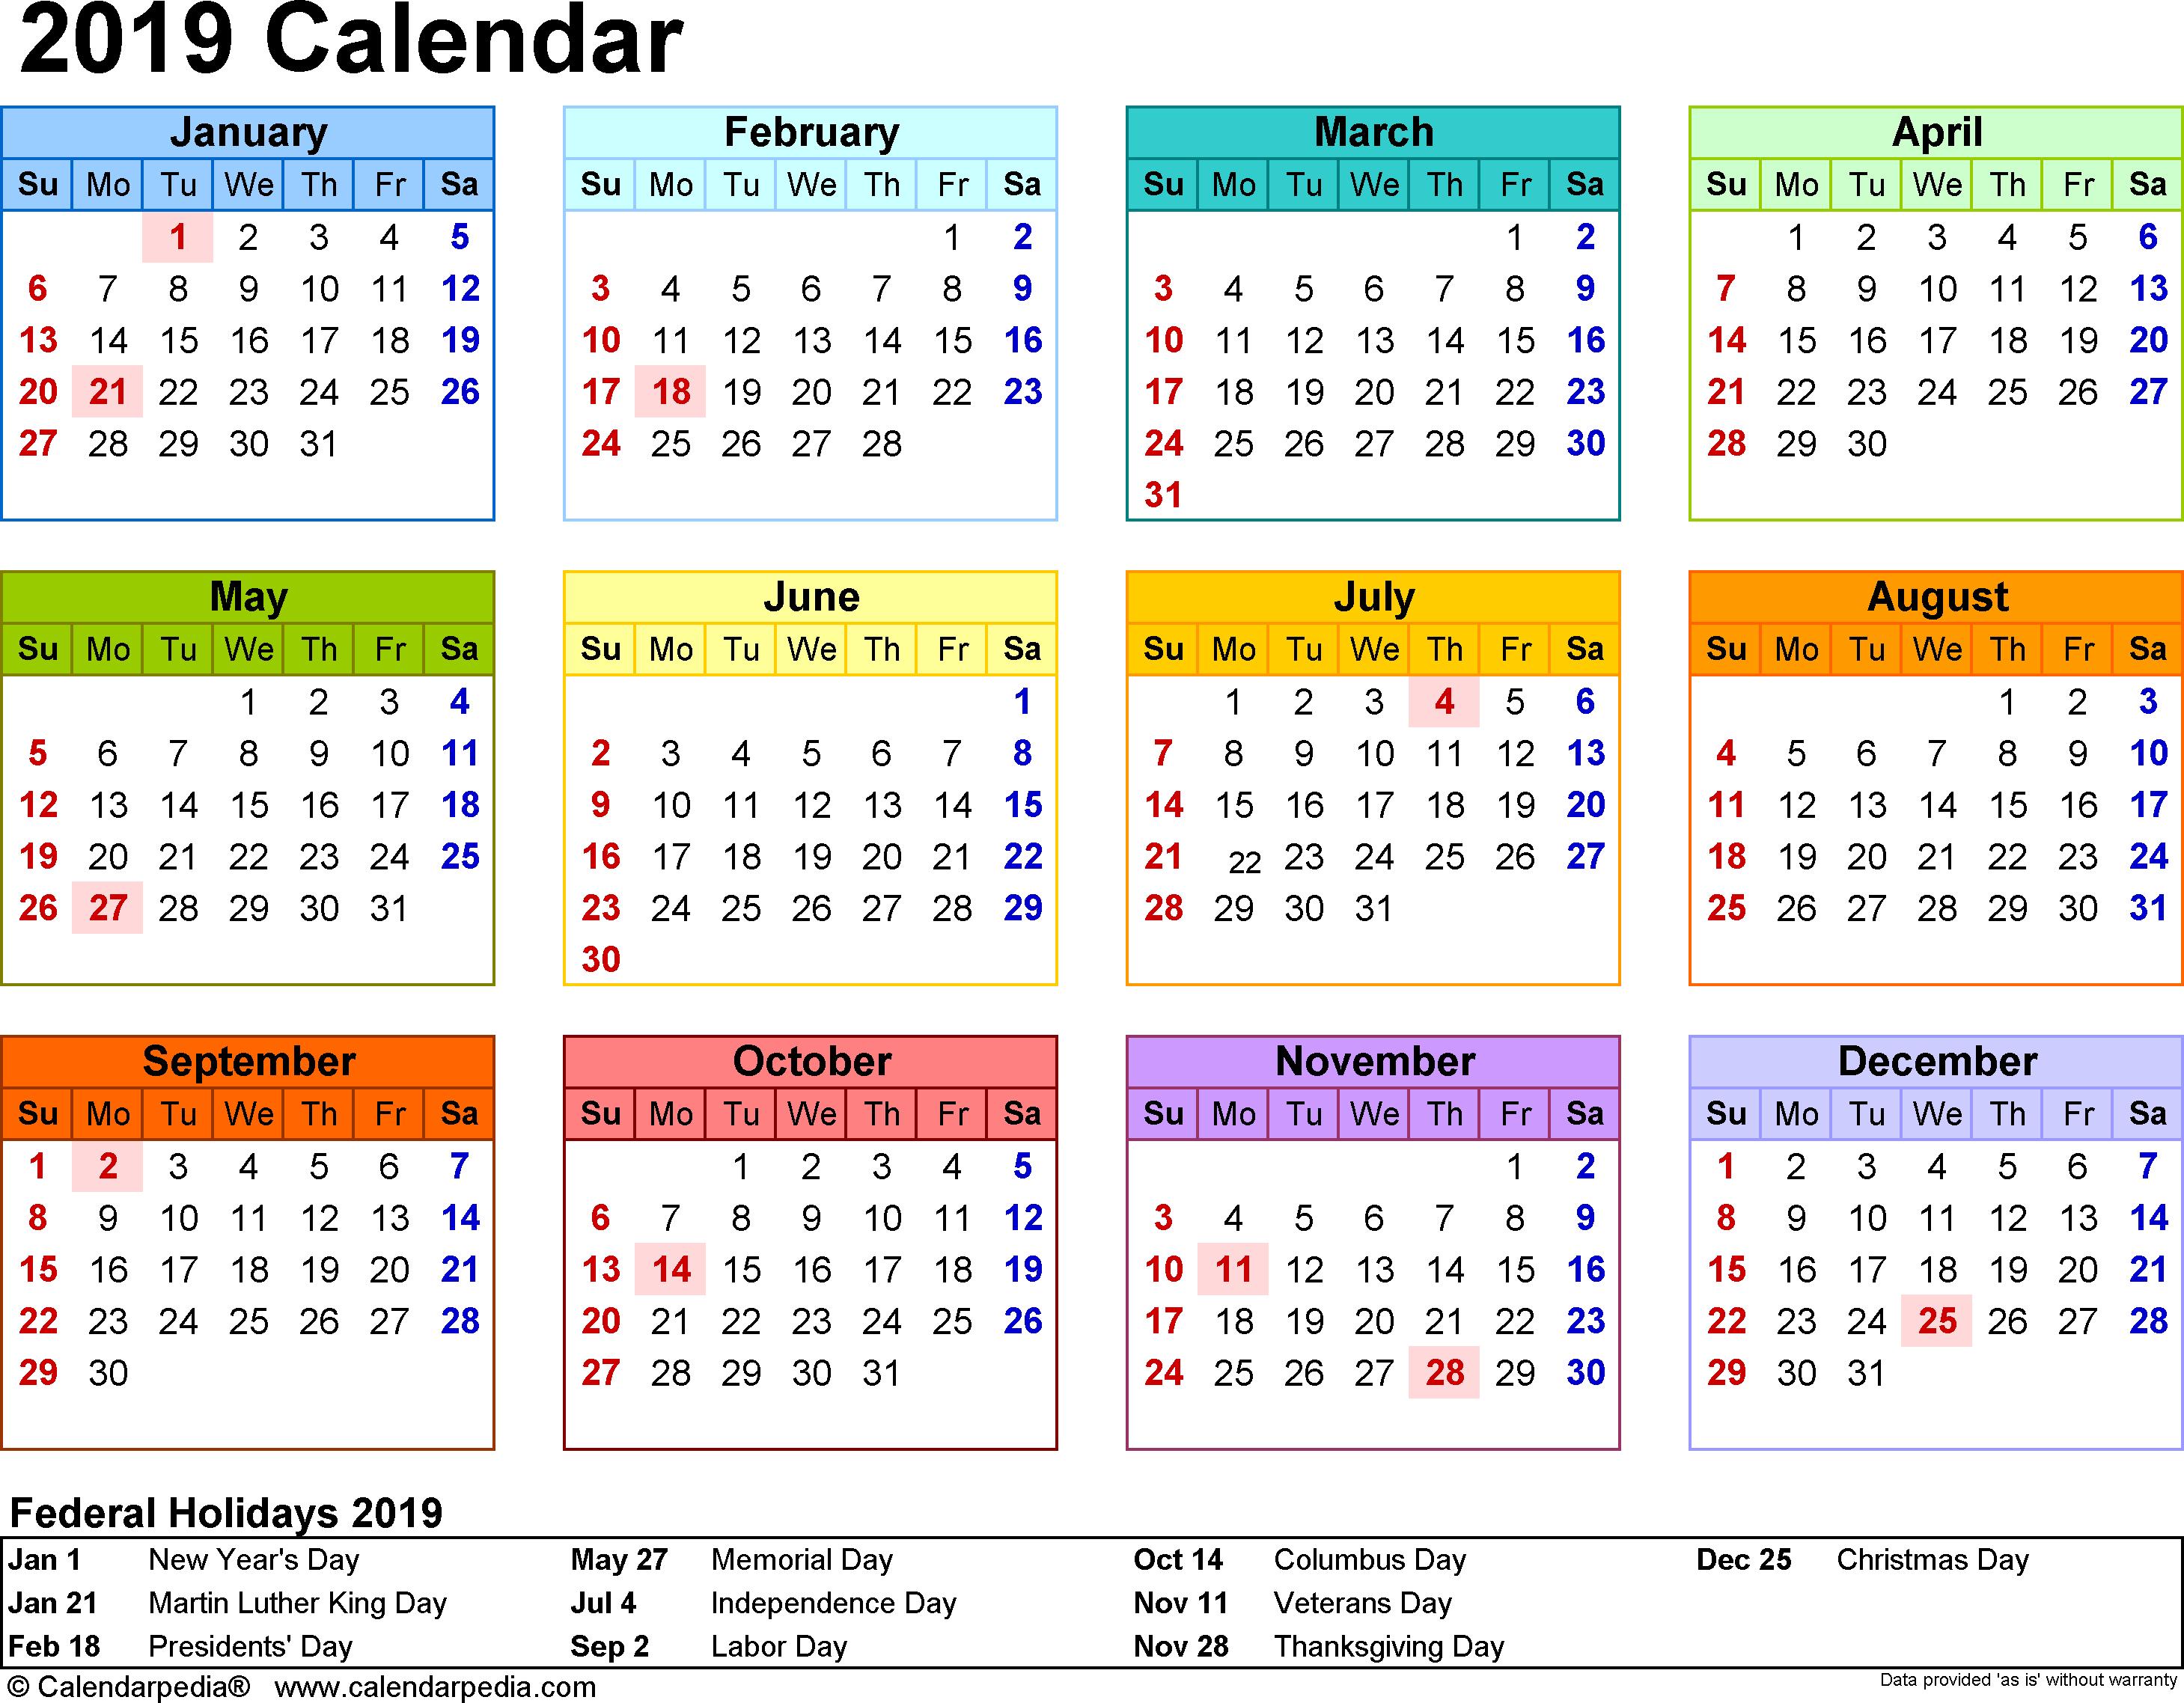 Printable School Calendar 2019 South Africa | Printable